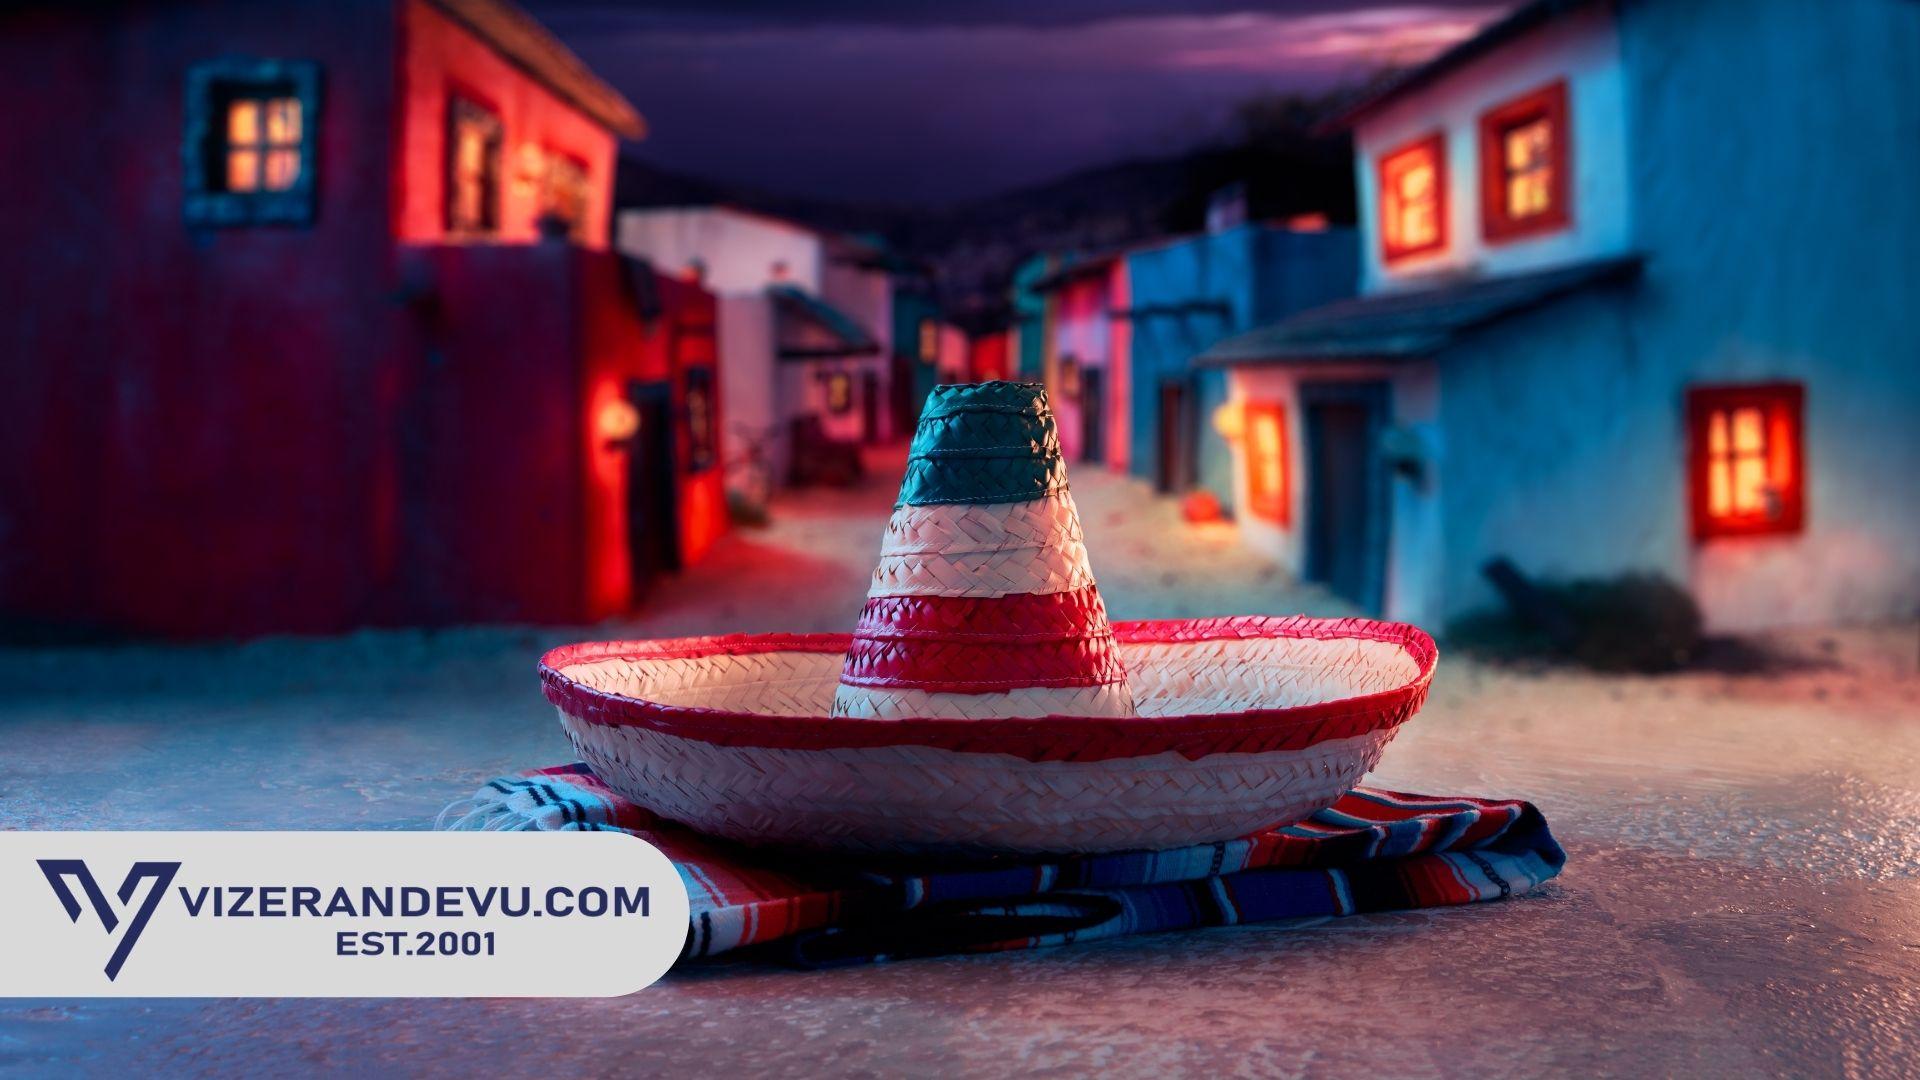 Meksika Vizesi: Randevu ve Başvuru (2021)